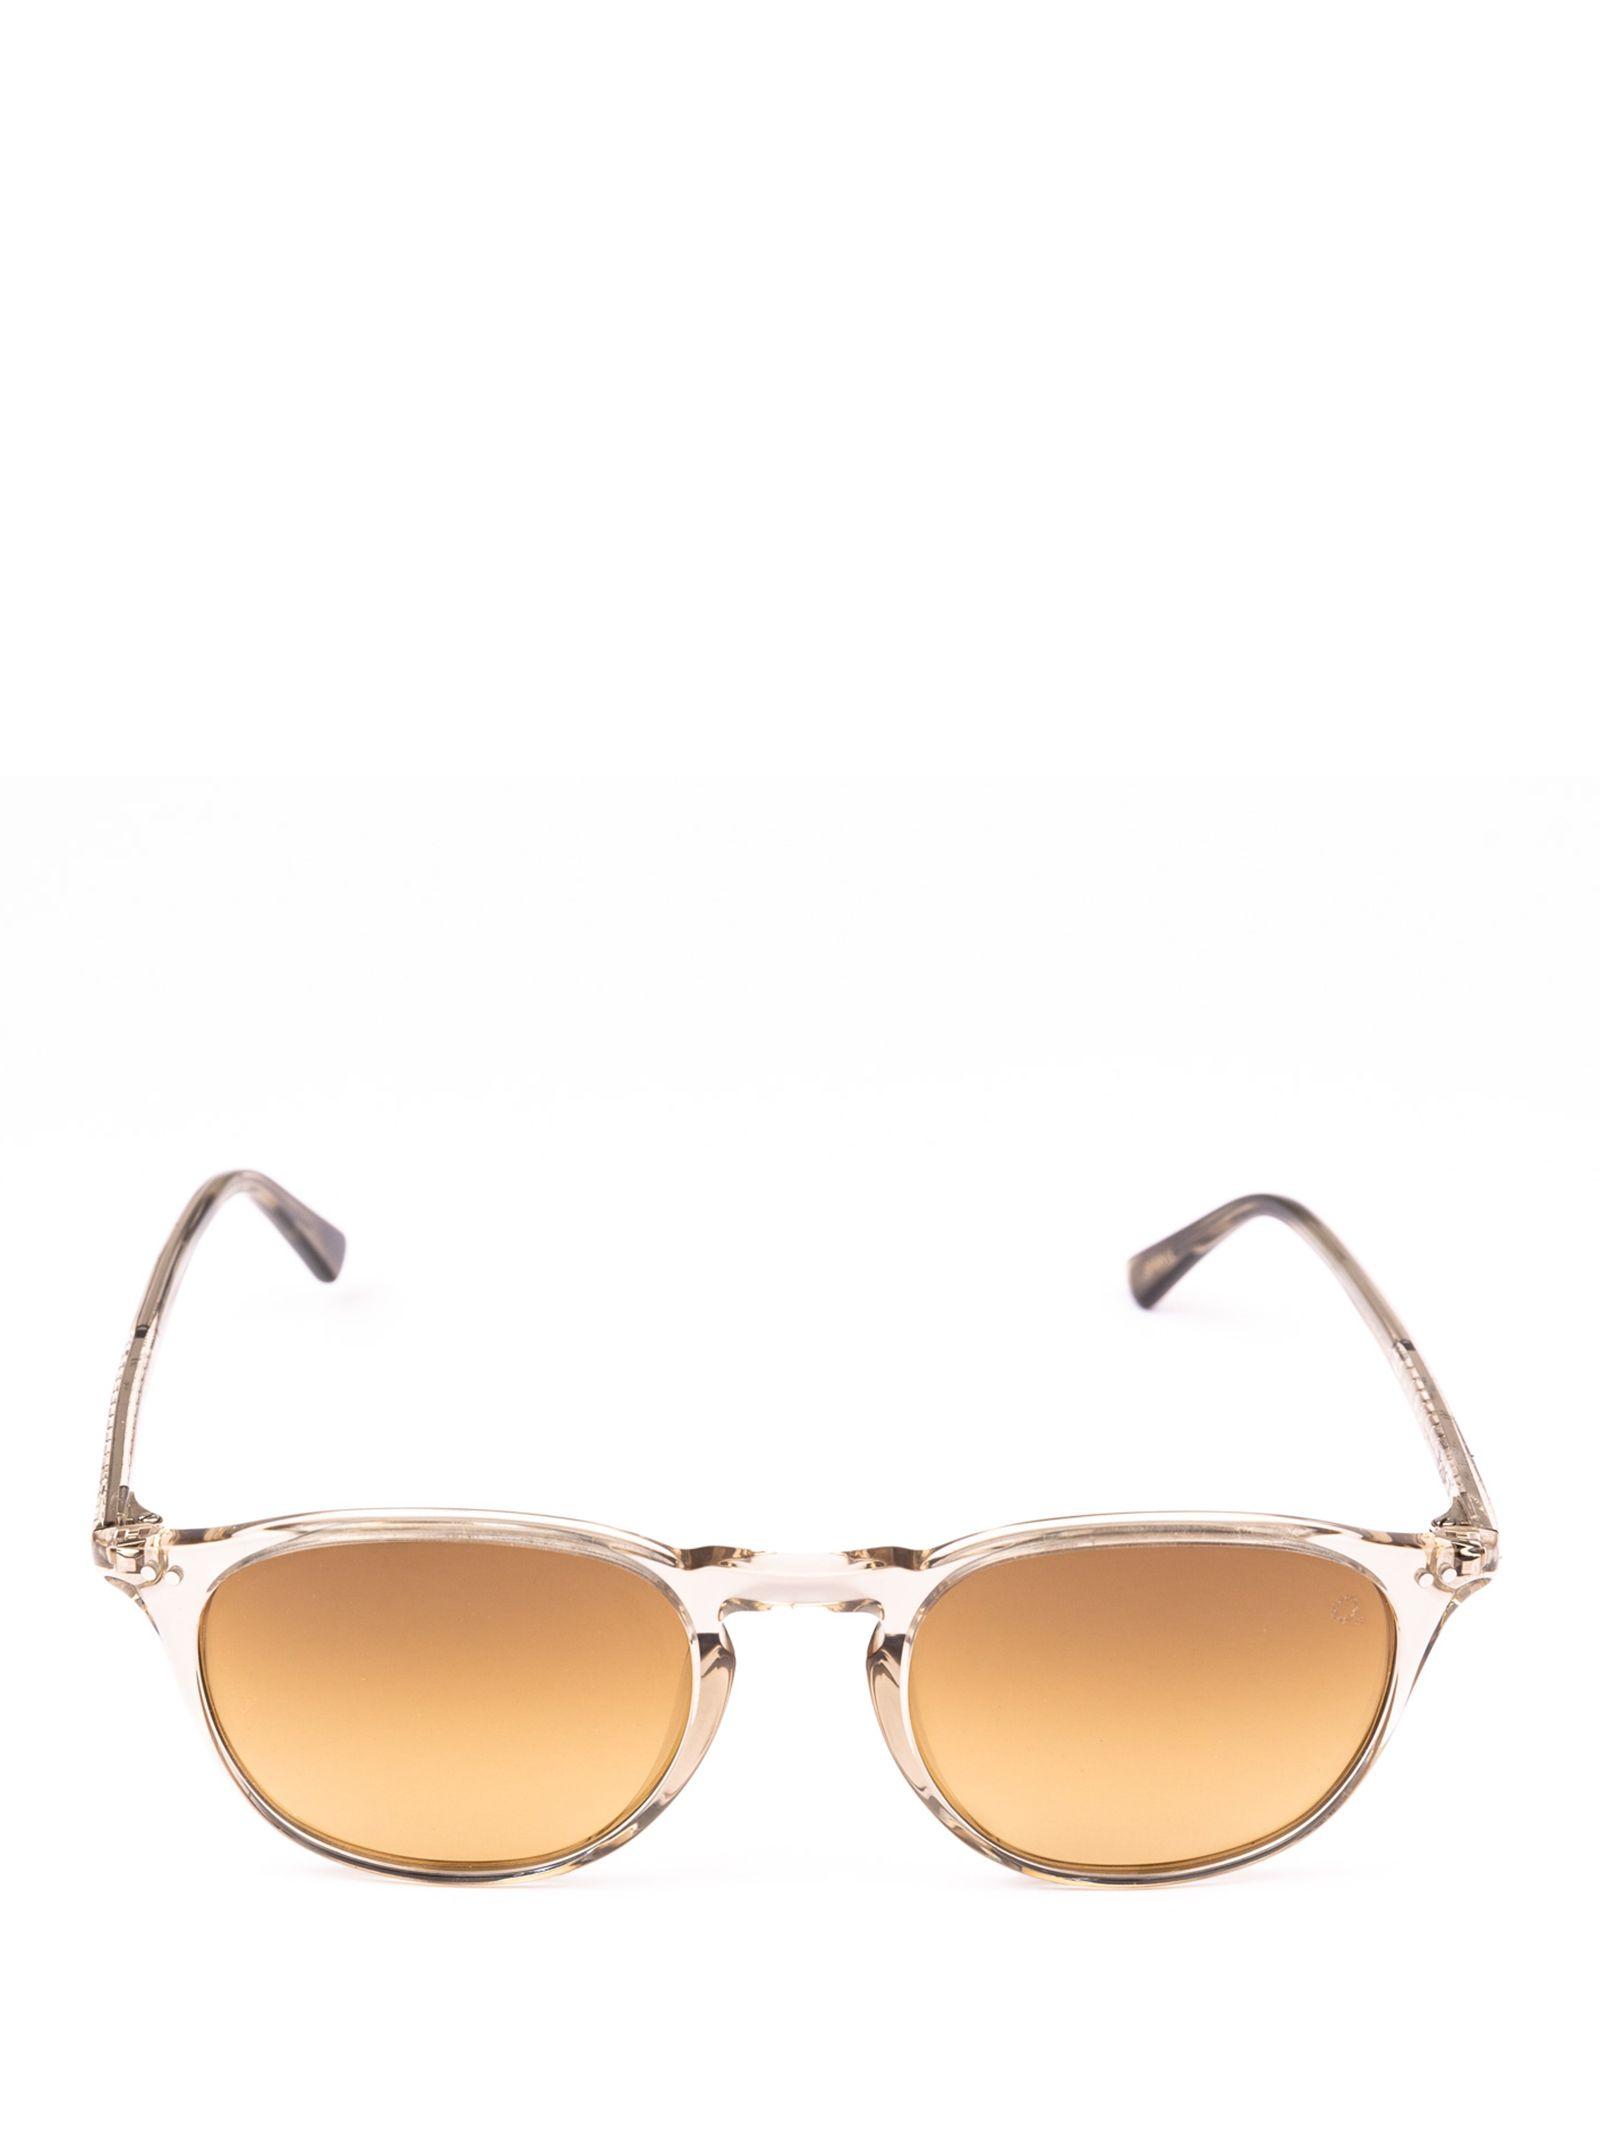 ETNIA BARCELONA Sunglasses in Brgy